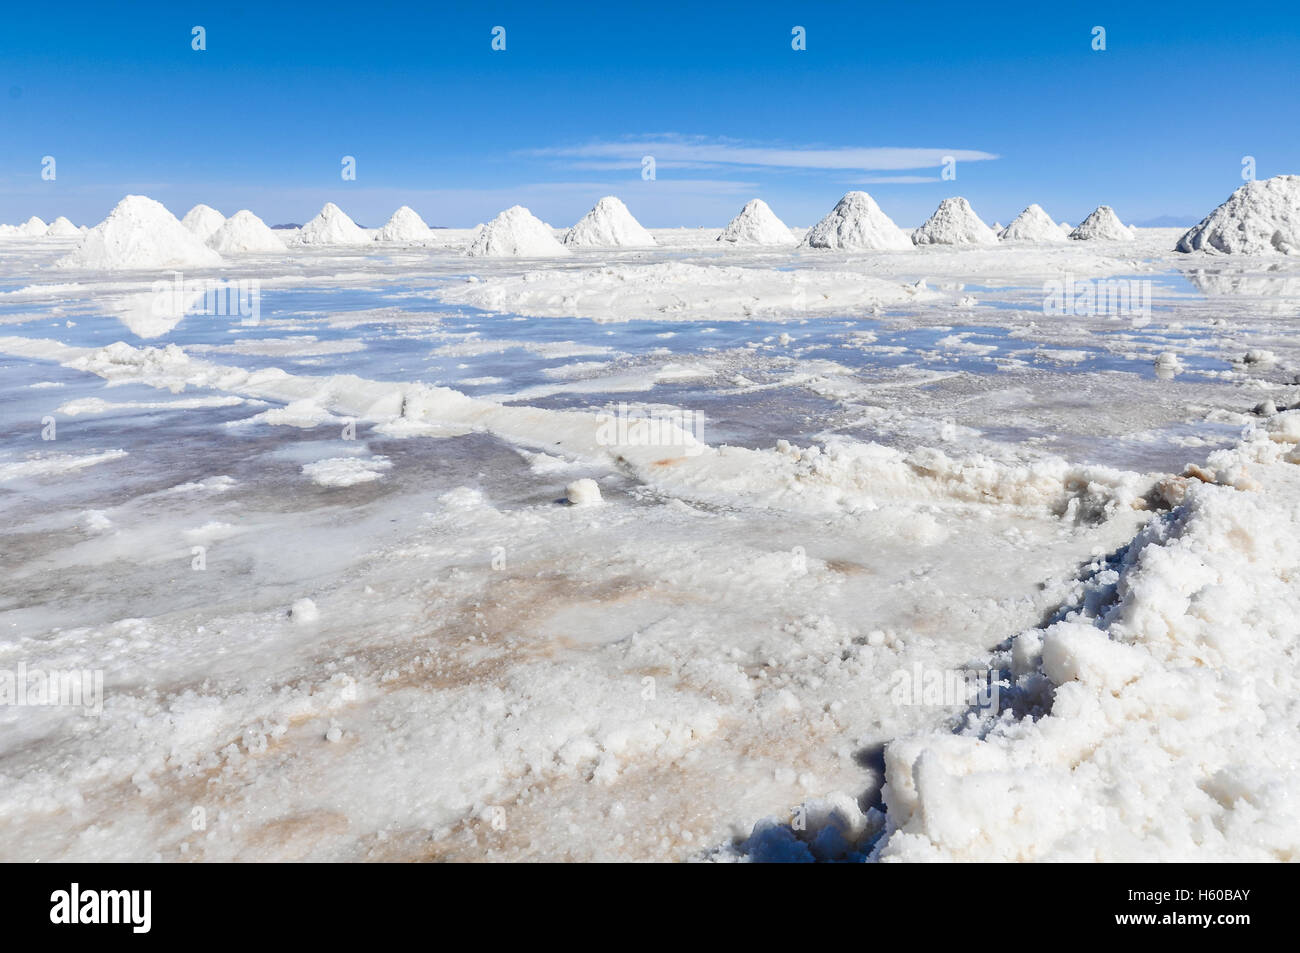 Piles of salt in Salar de Uyuni, the biggest salt flat in the world, Bolivia - Stock Image